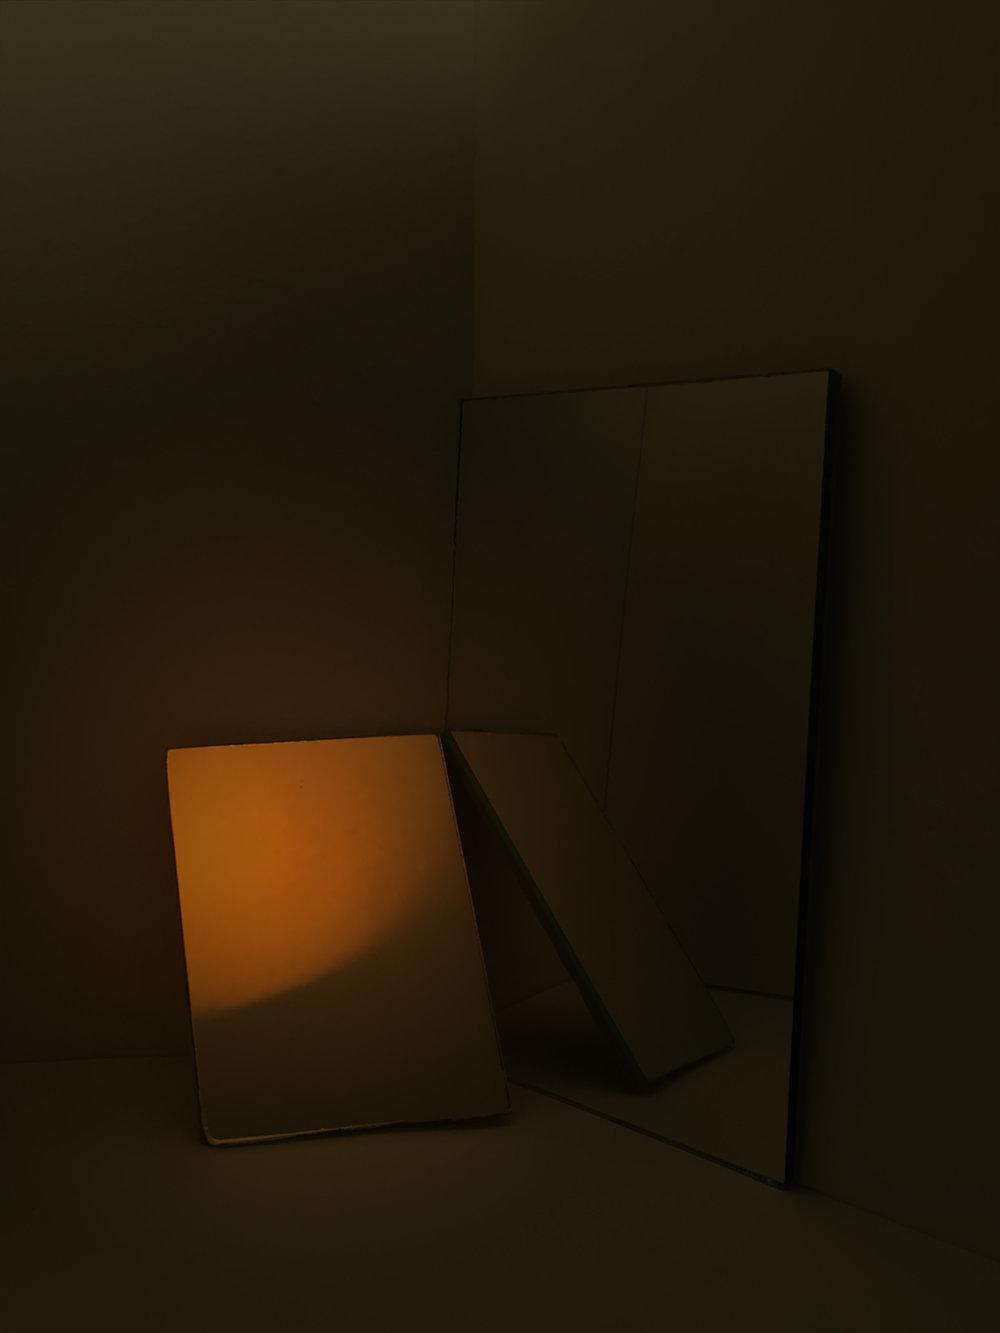 MirrorStudy18.jpg